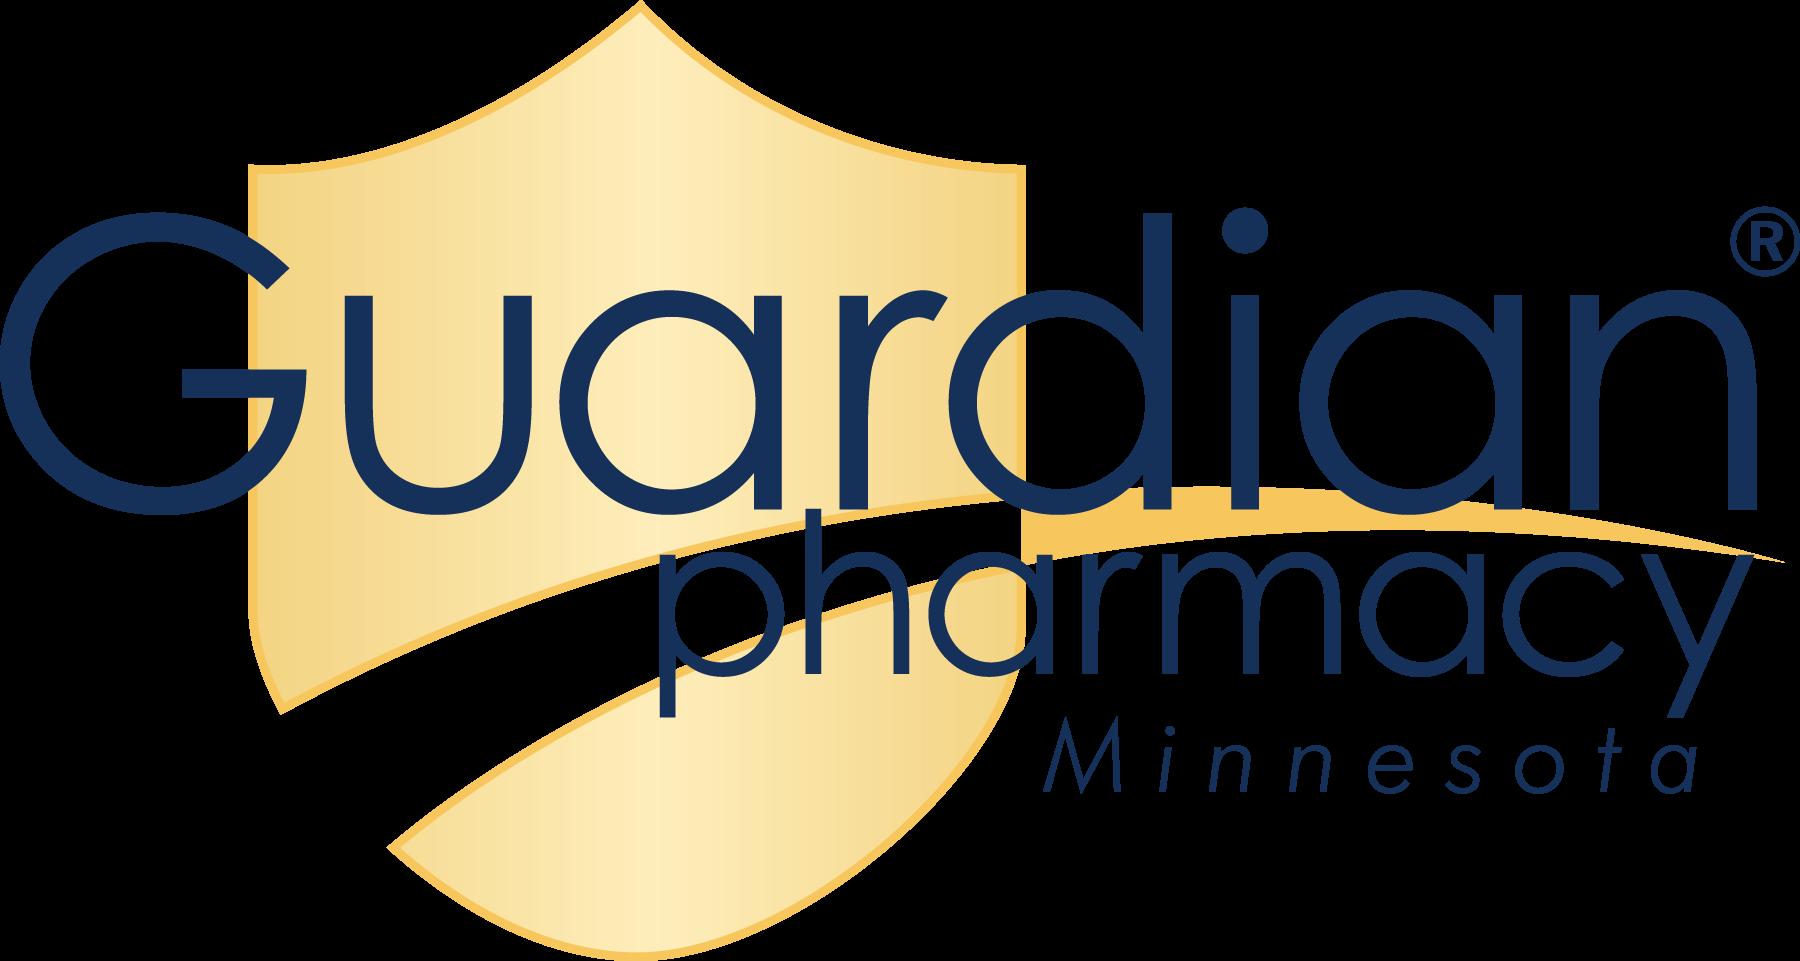 Guardian Pharmacy of Minnesota